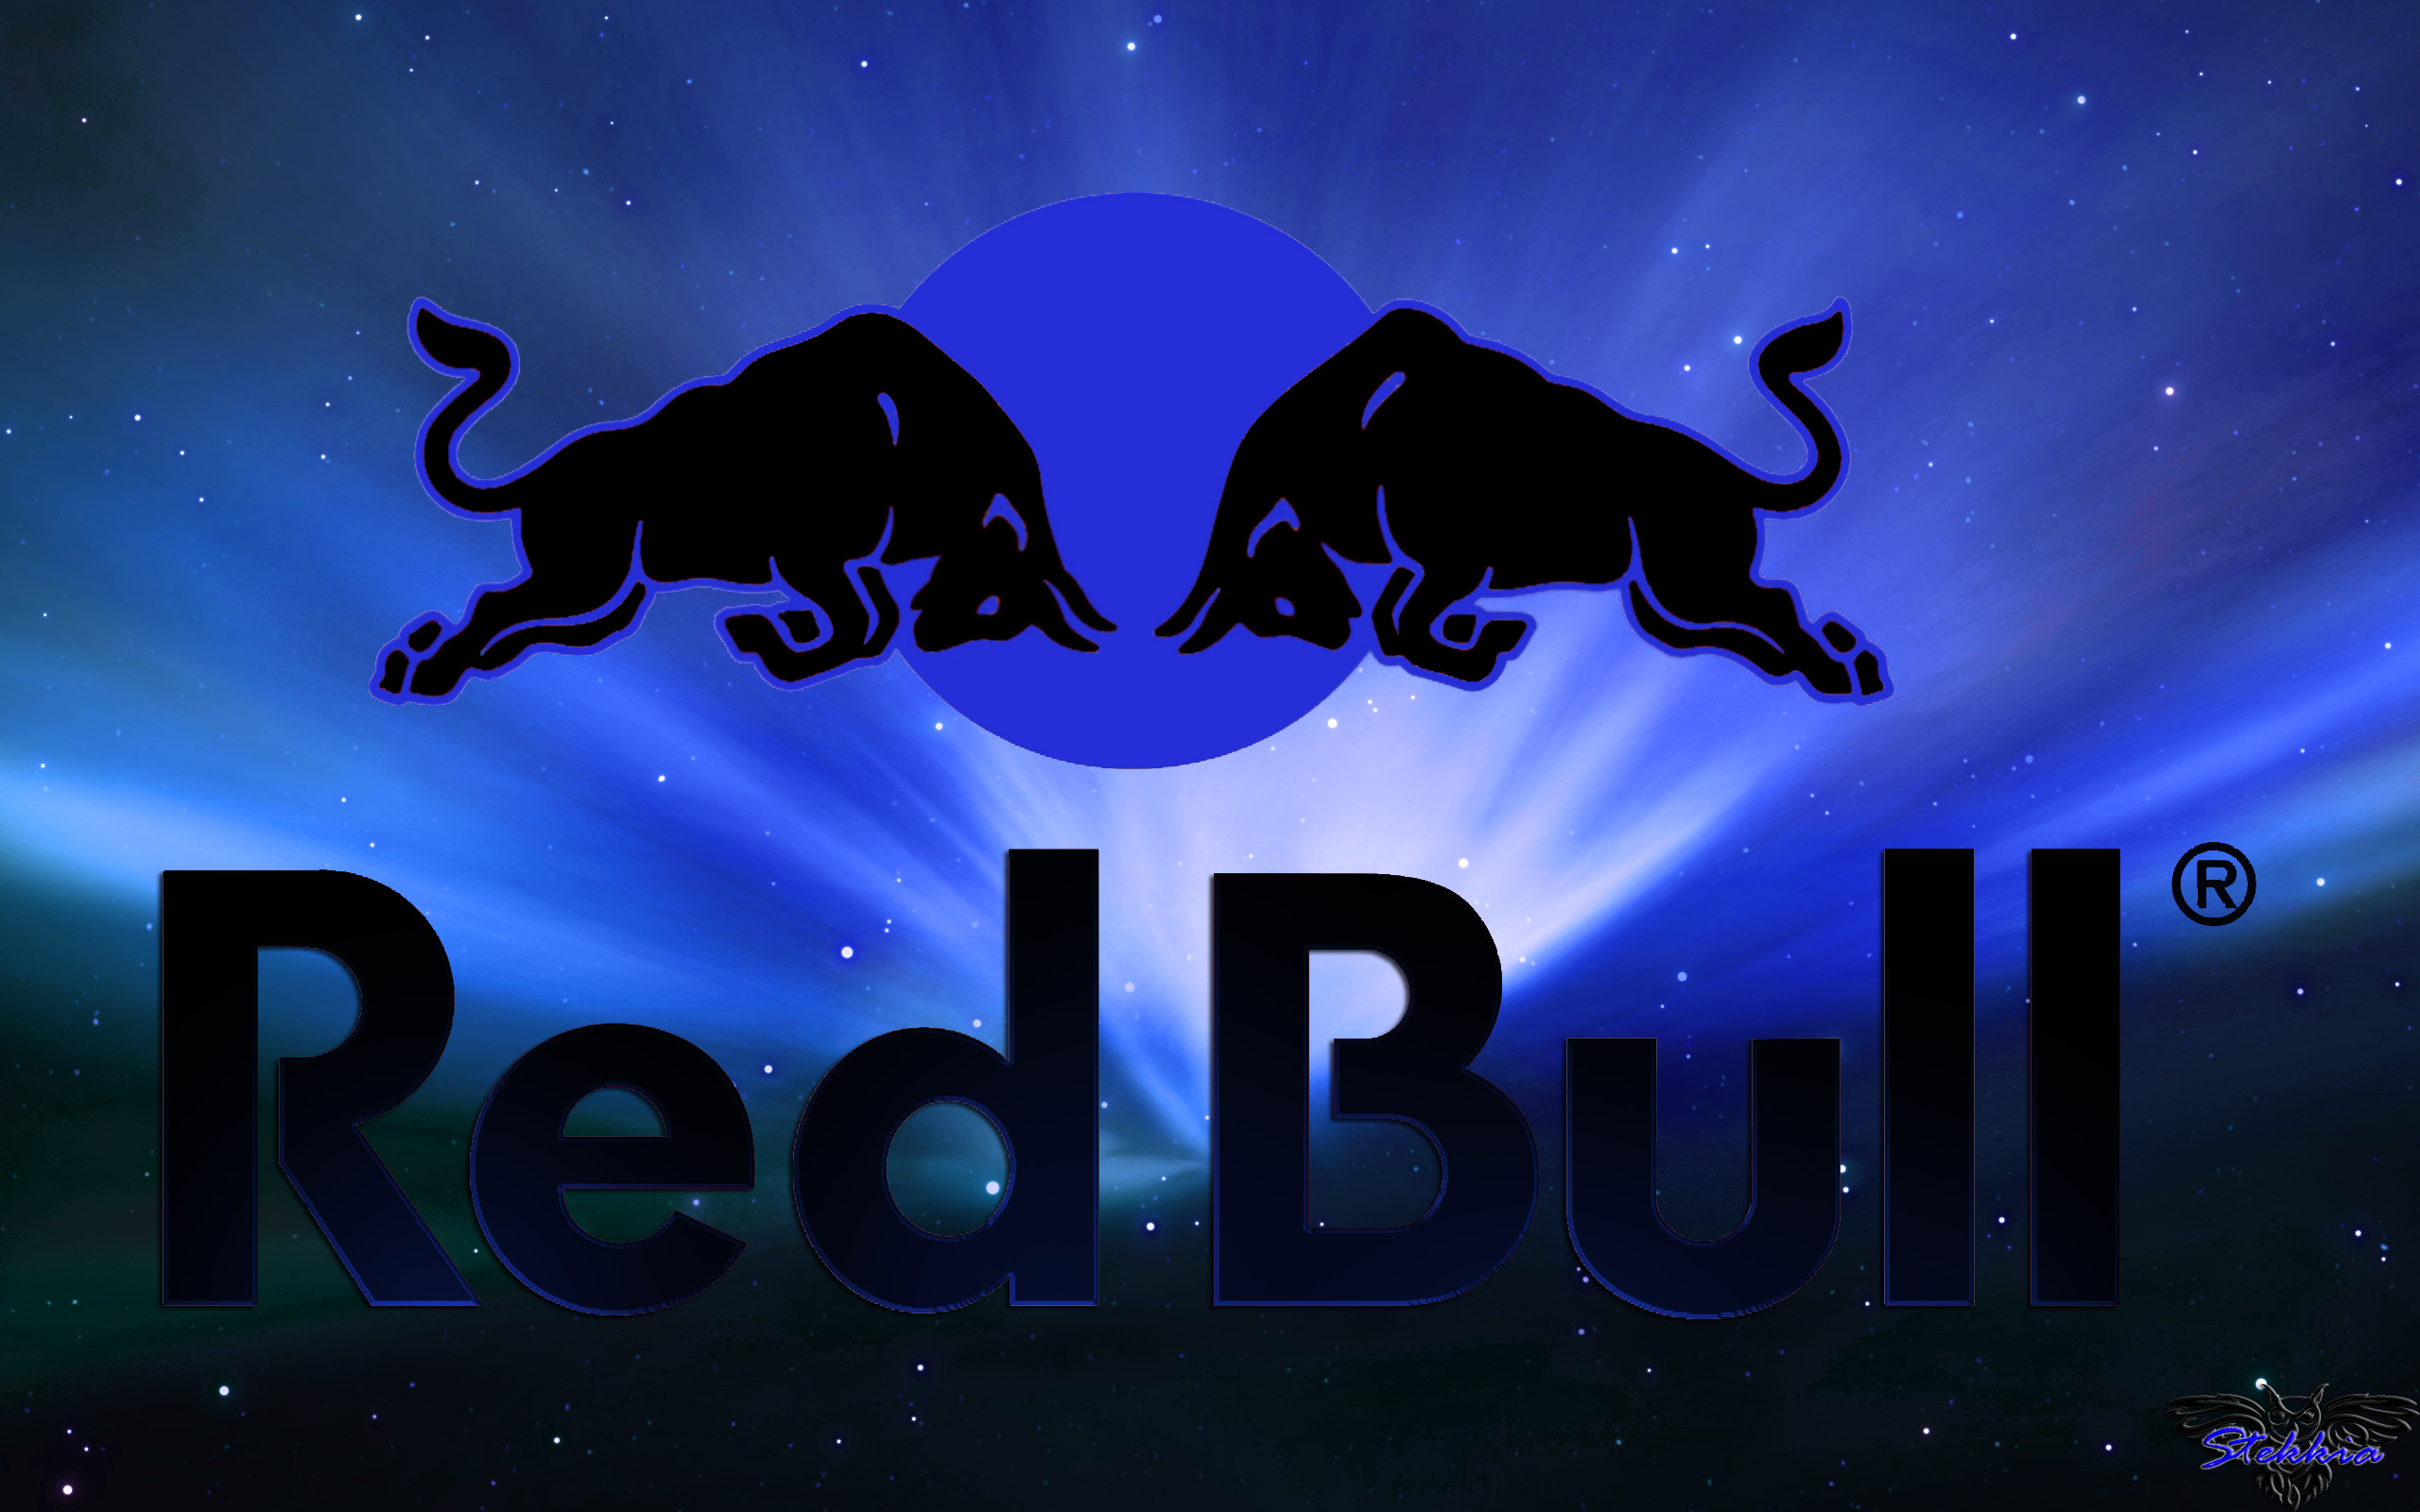 red bull Desktop and mobile wallpaper Wallippo 2560x1600